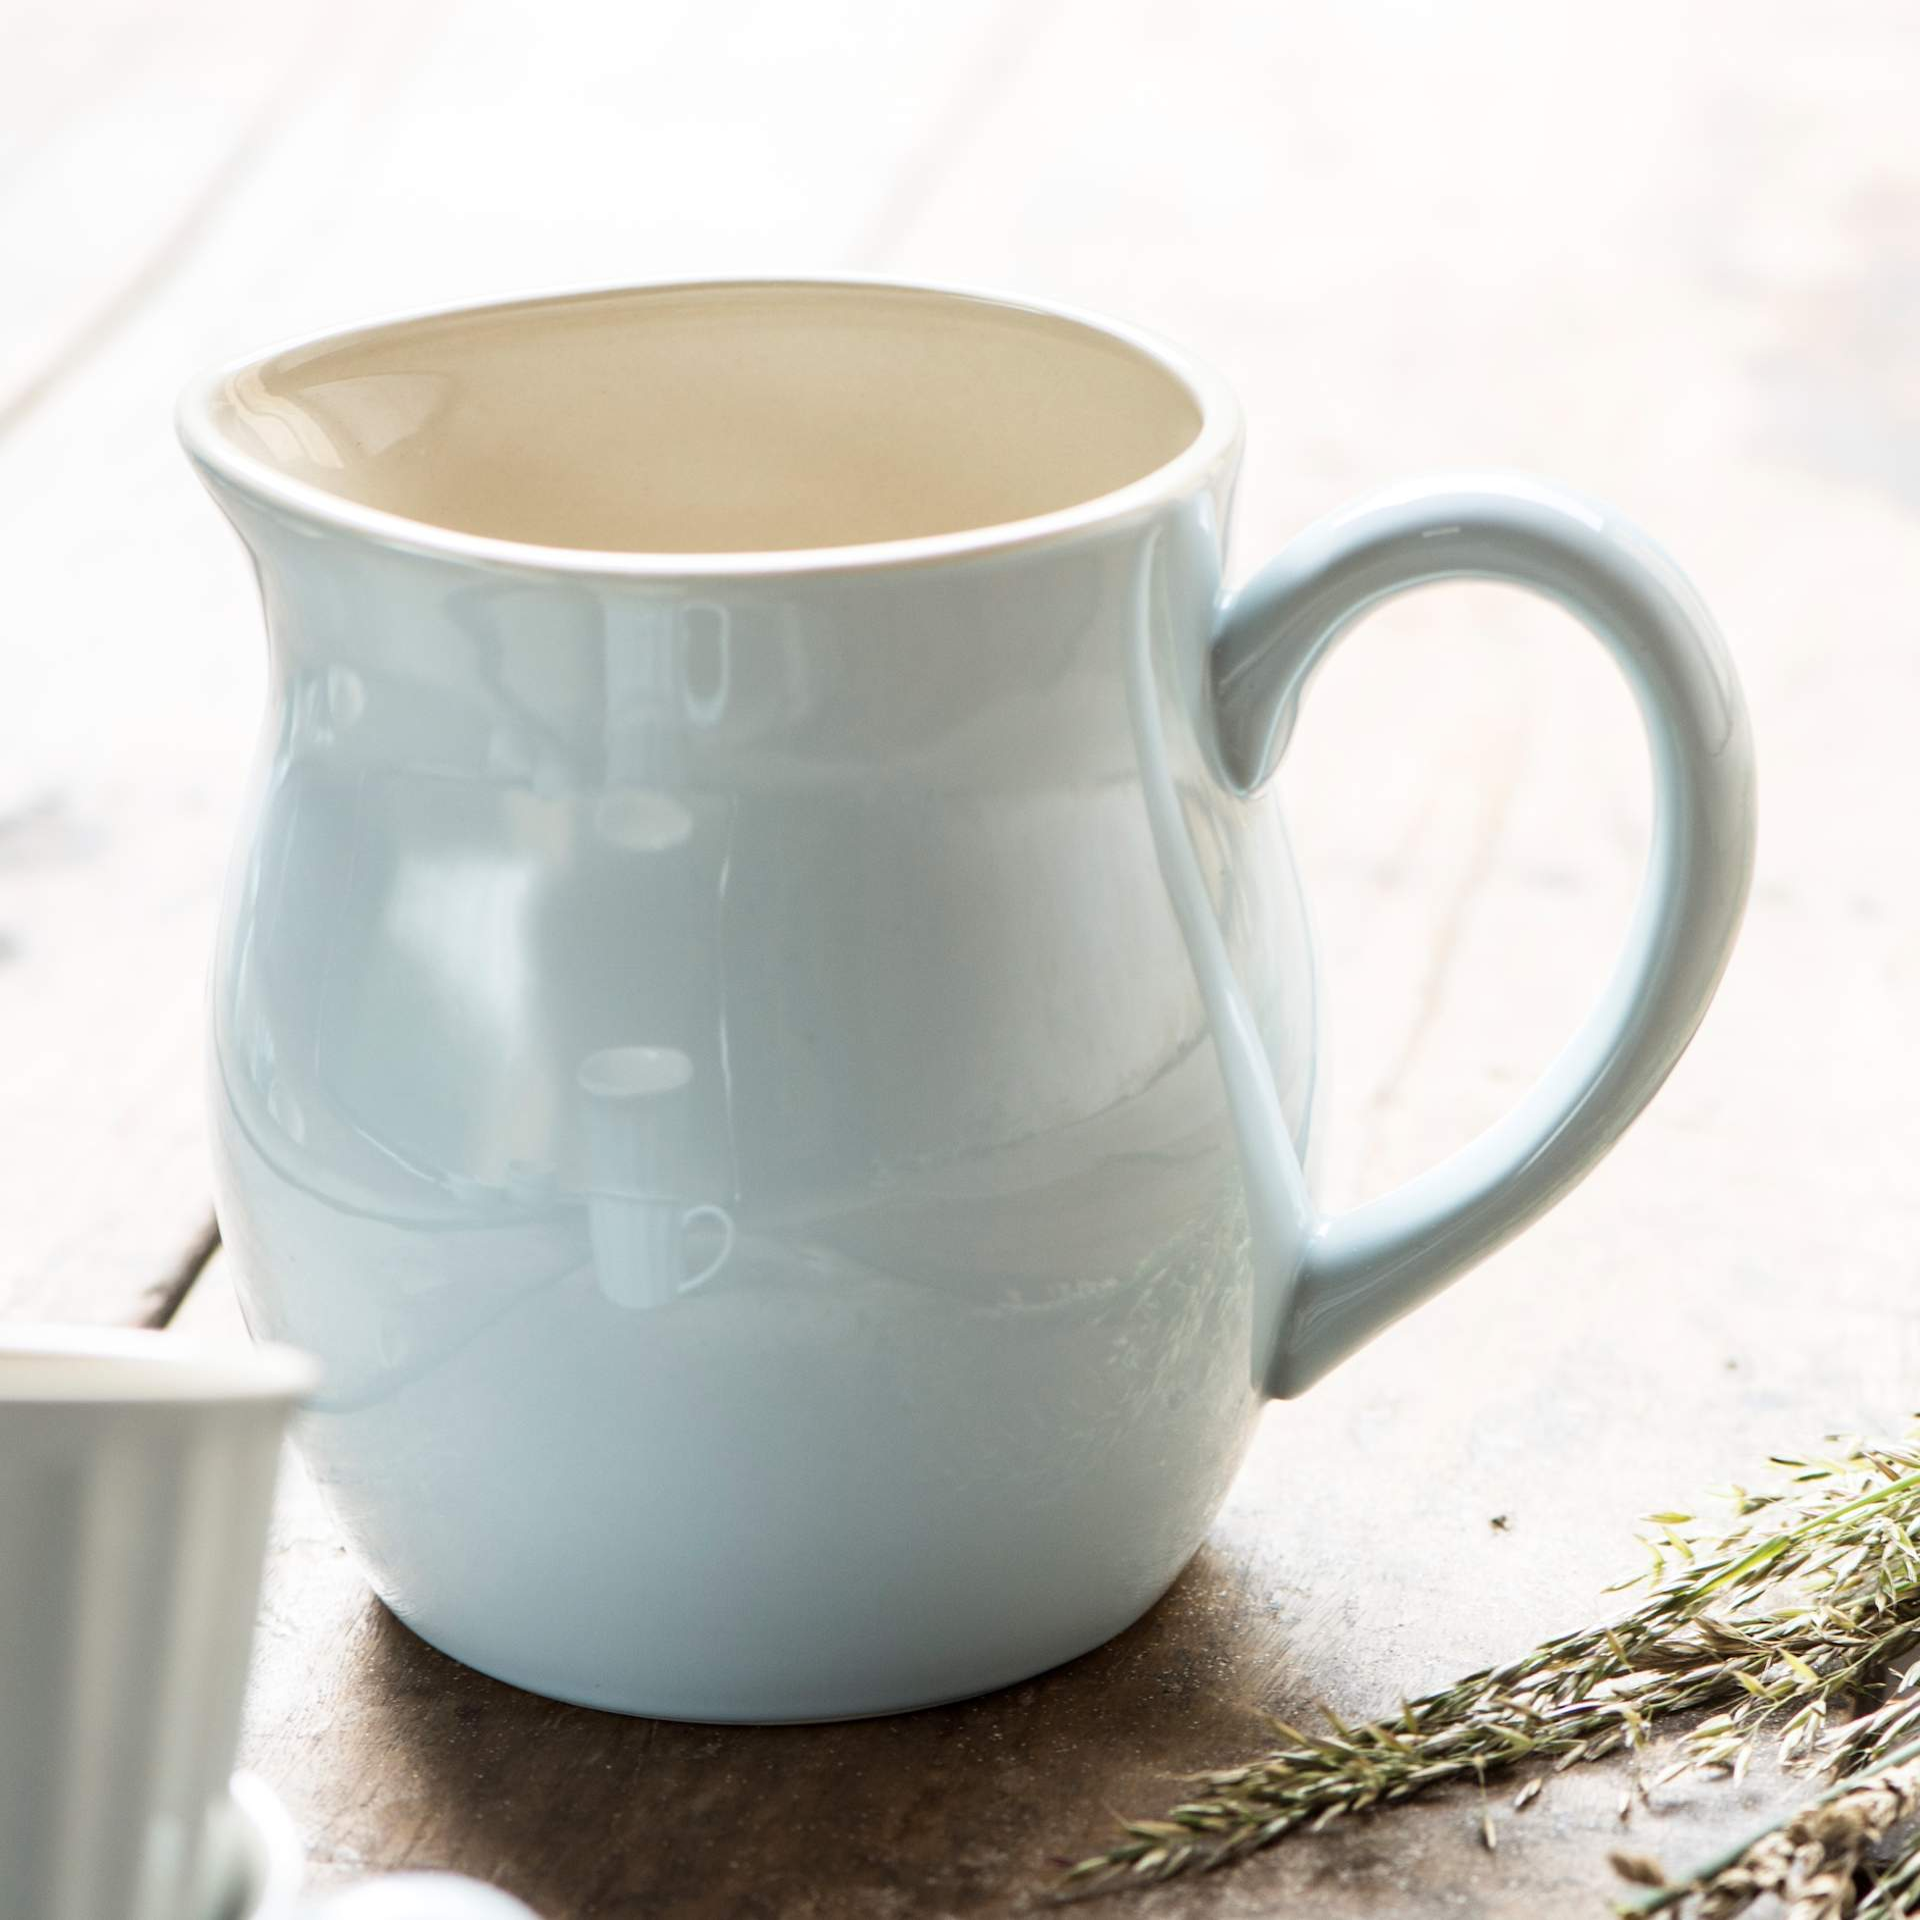 IB LAURSEN Džbán Mynte Stillwater 2,5 l, modrá barva, keramika